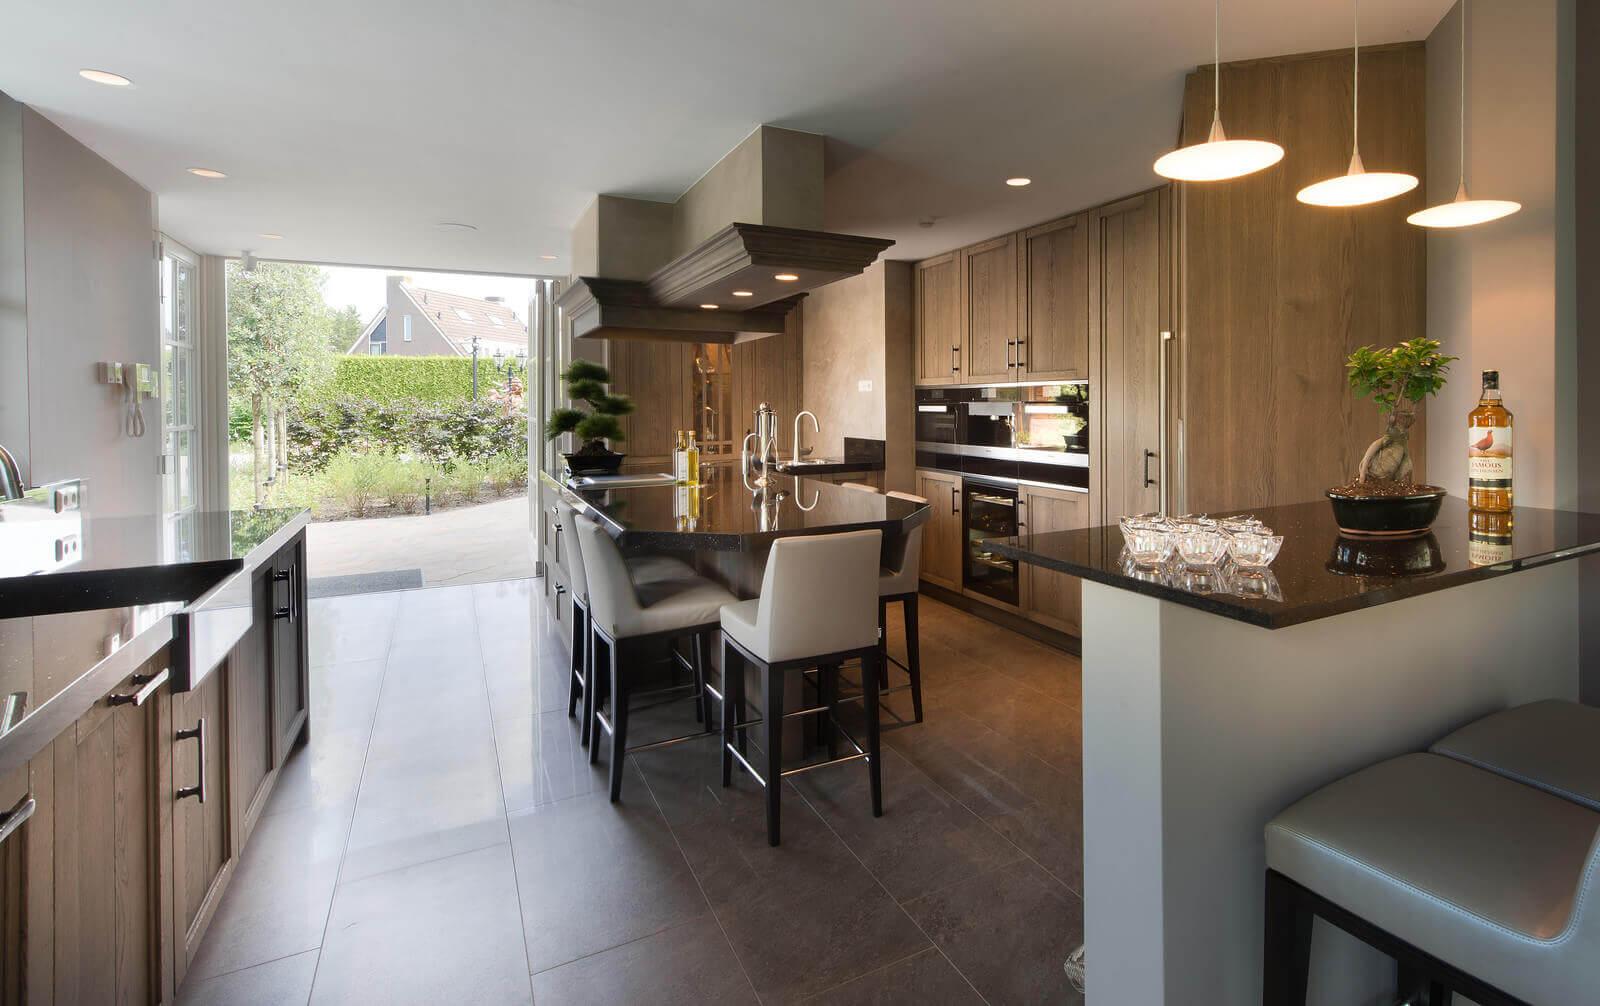 Landhuiskeuken van Tieleman Keukens